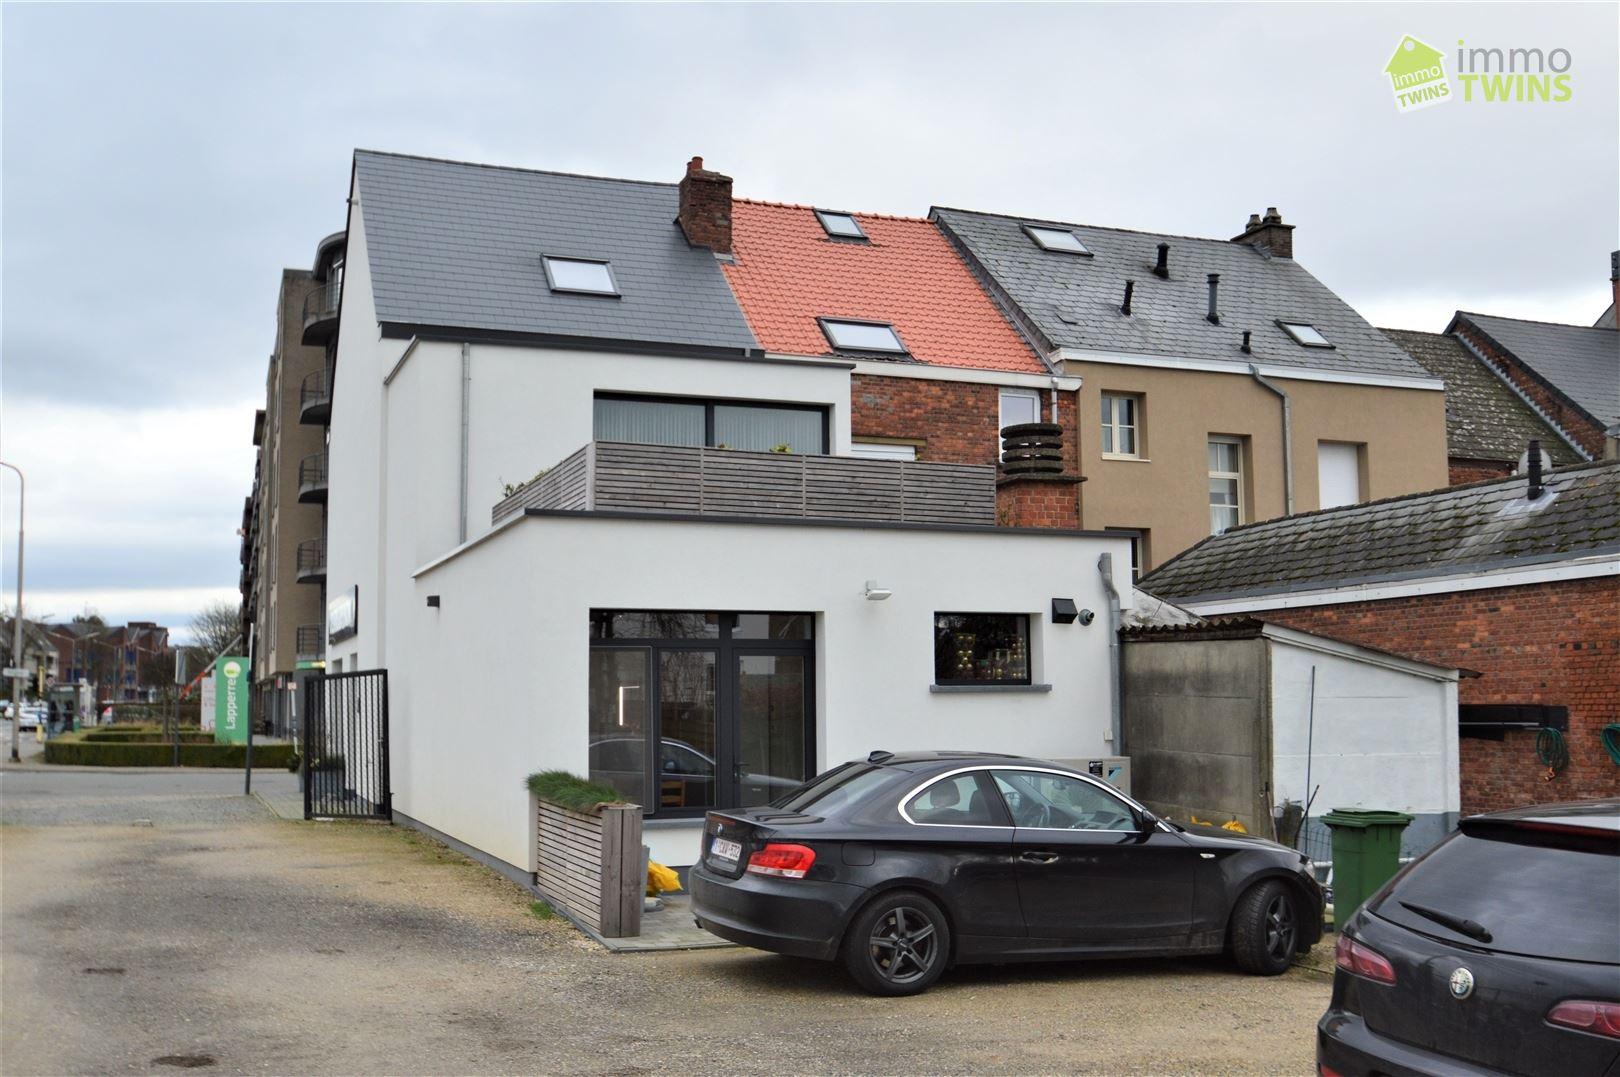 Foto 11 : Duplex/triplex te 9200 DENDERMONDE (België) - Prijs € 650